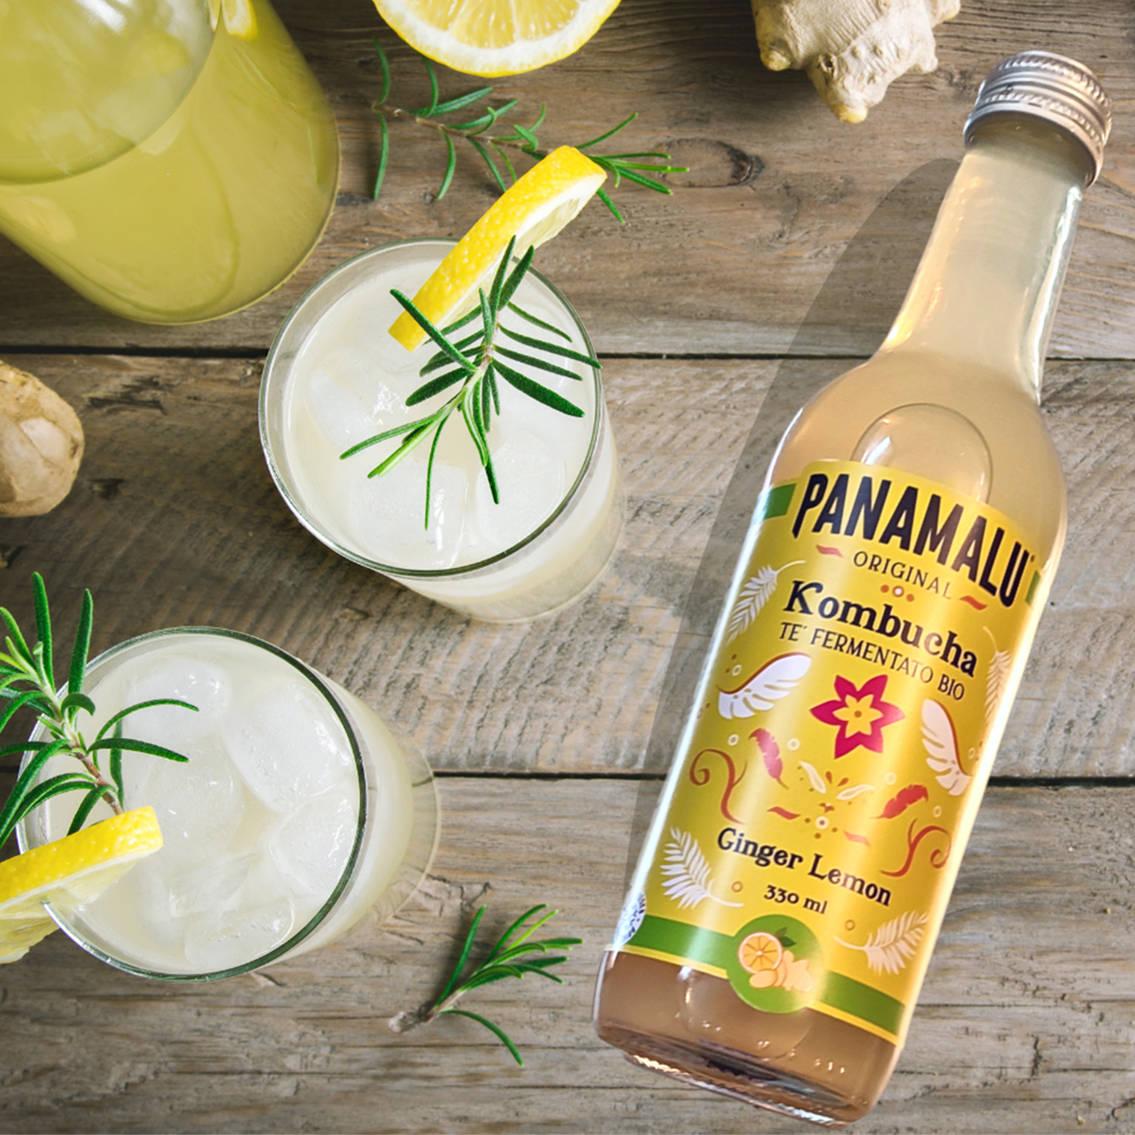 Panamalu, Original Kombucha